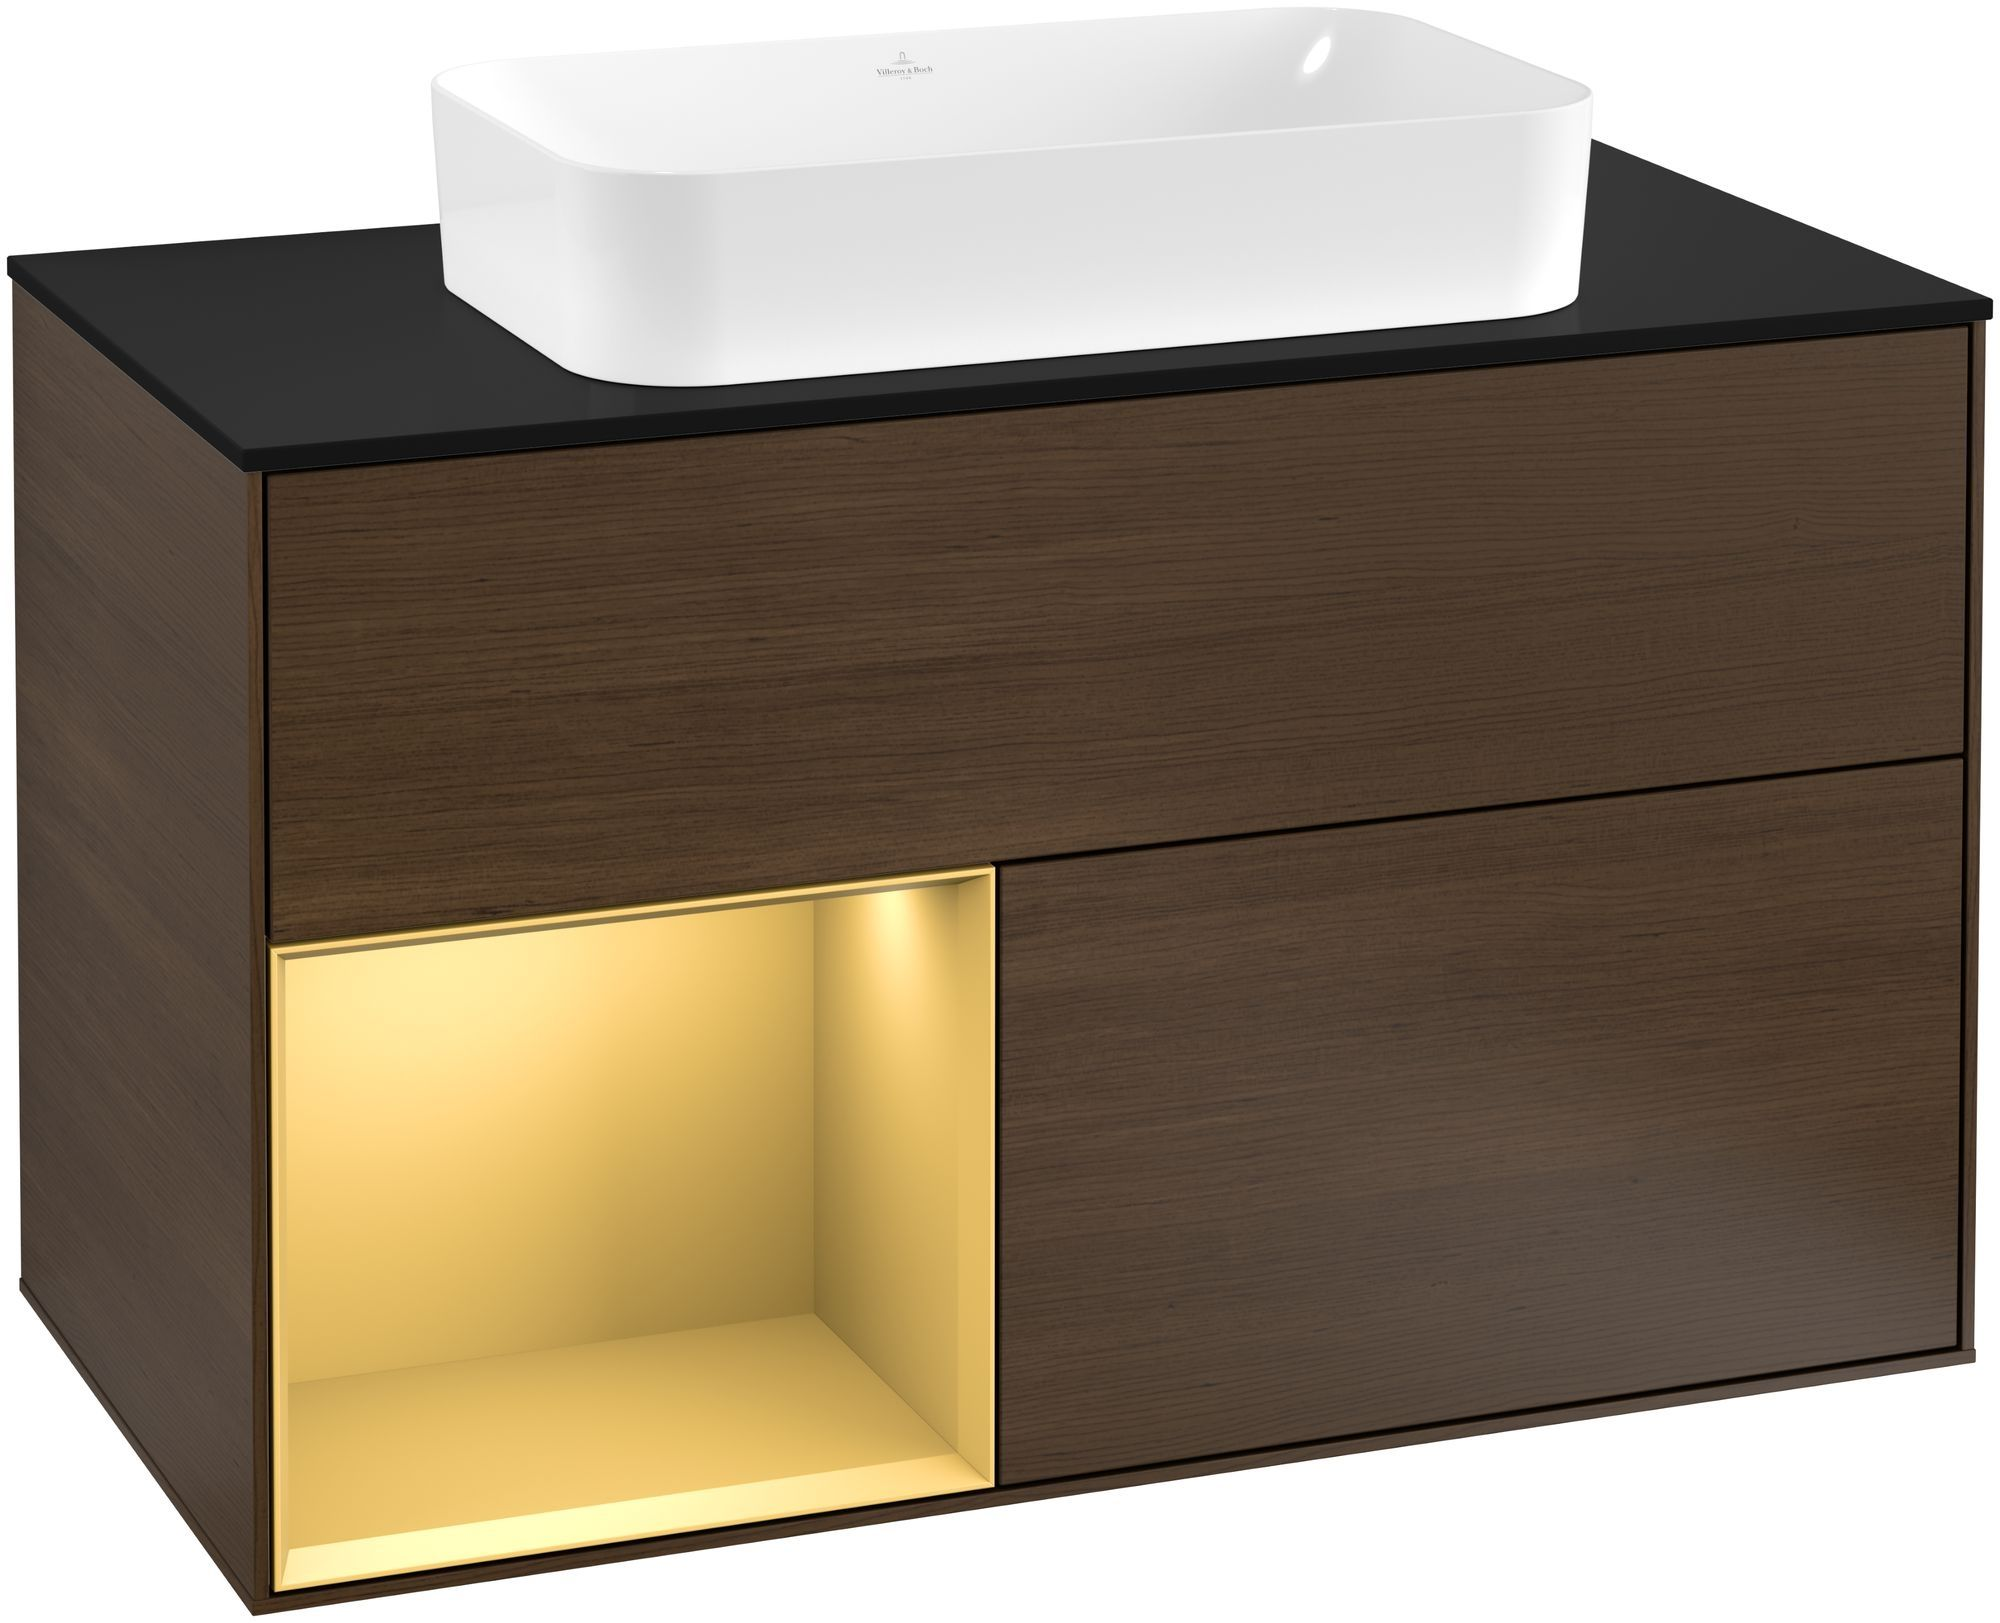 Villeroy & Boch Finion G24 Waschtischunterschrank mit Regalelement 2 Auszüge Waschtisch mittig LED-Beleuchtung B:100xH:60,3xT:50,1cm Front, Korpus: Walnut Veneer, Regal: Gold Matt, Glasplatte: Black Matt G242HFGN